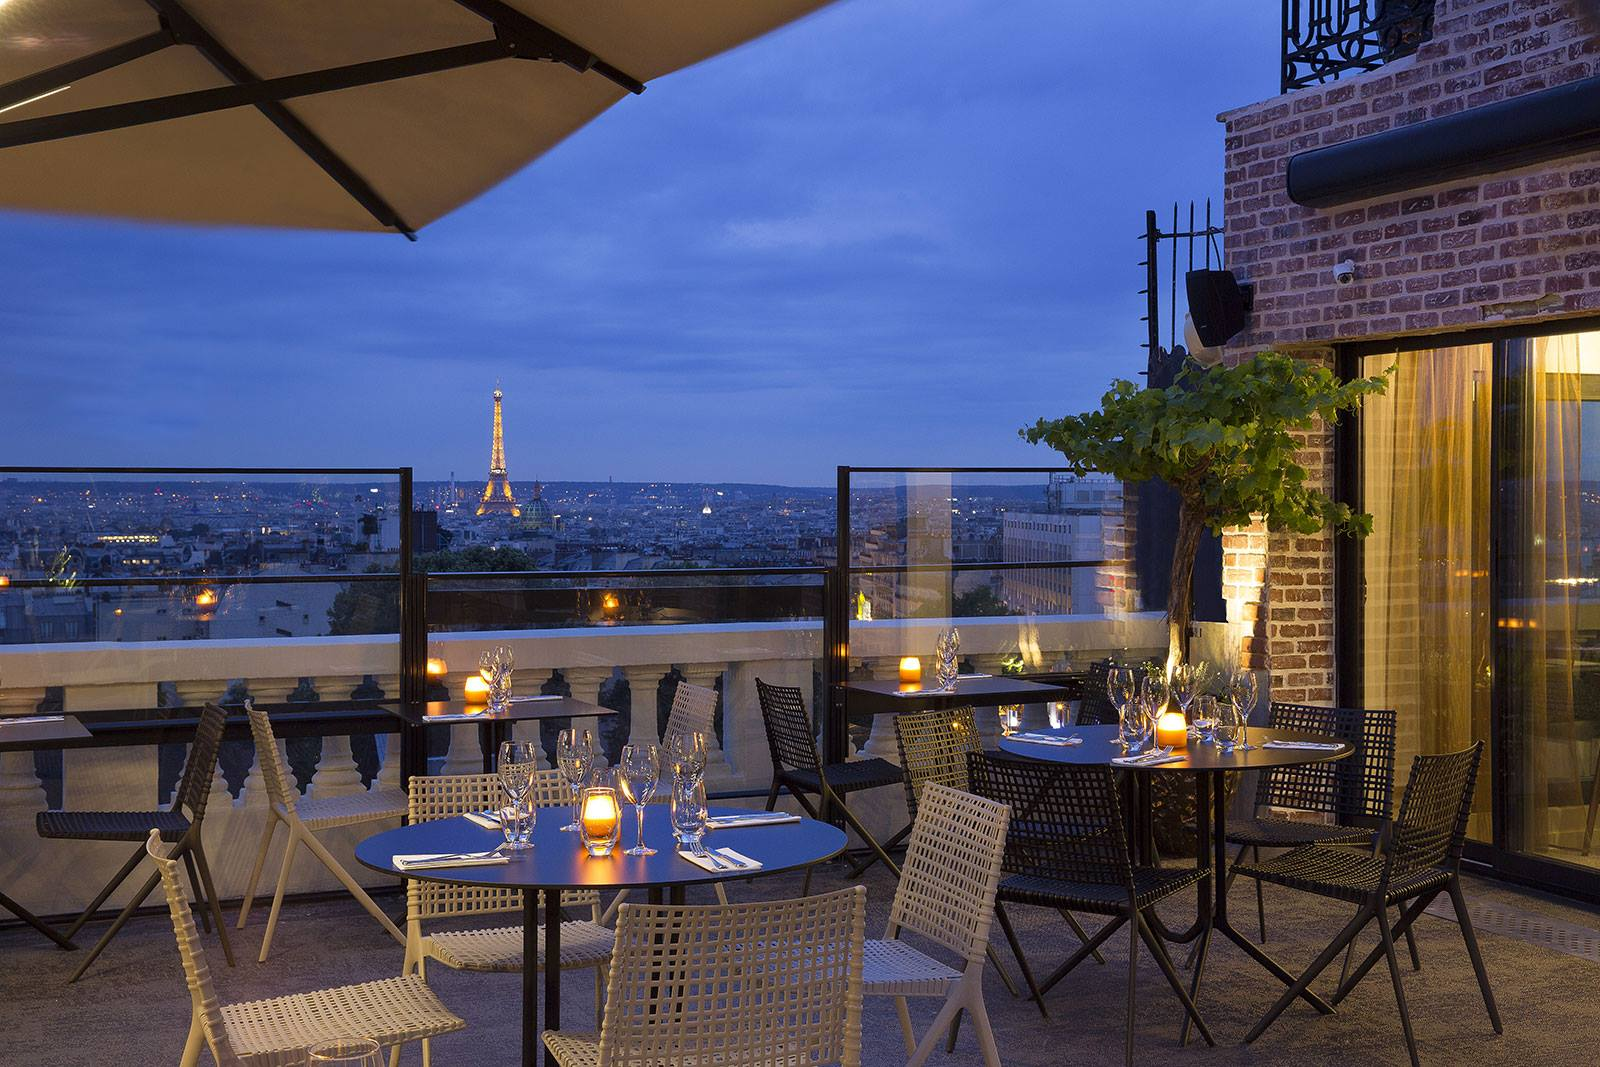 Terrass Hotel Eiffel TOwer view paris